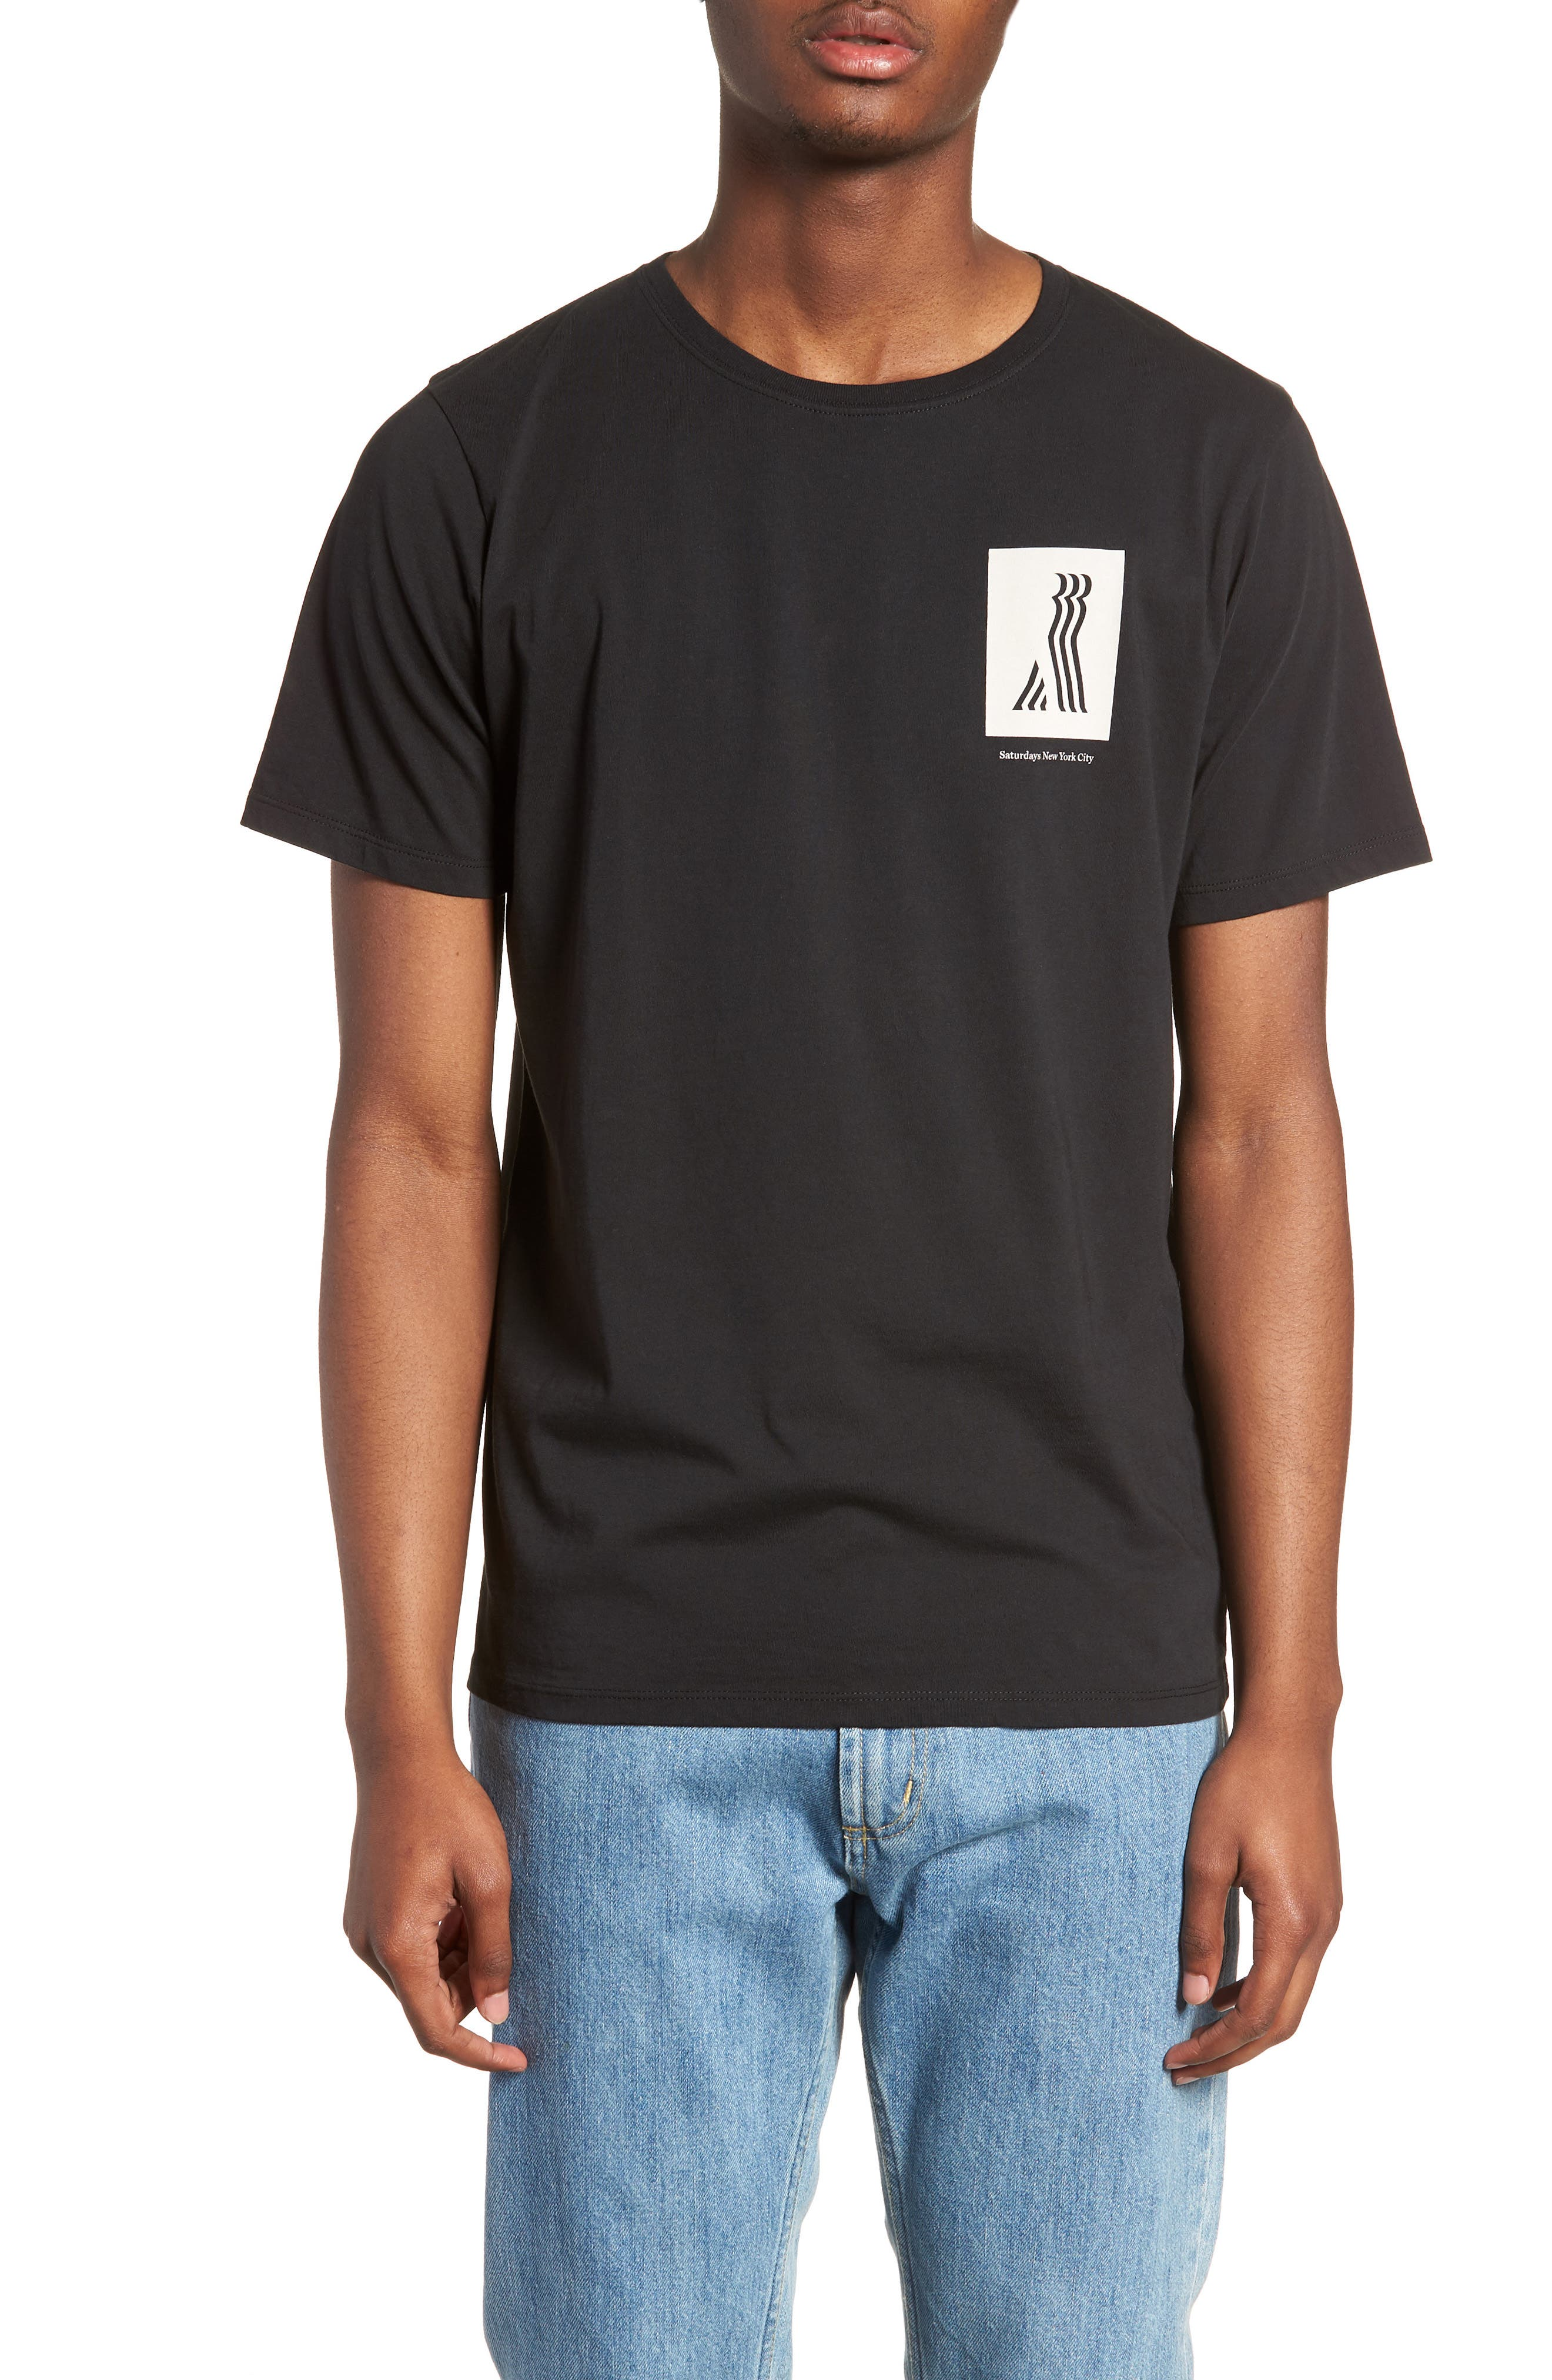 Walking Man T-Shirt,                         Main,                         color, BLACK